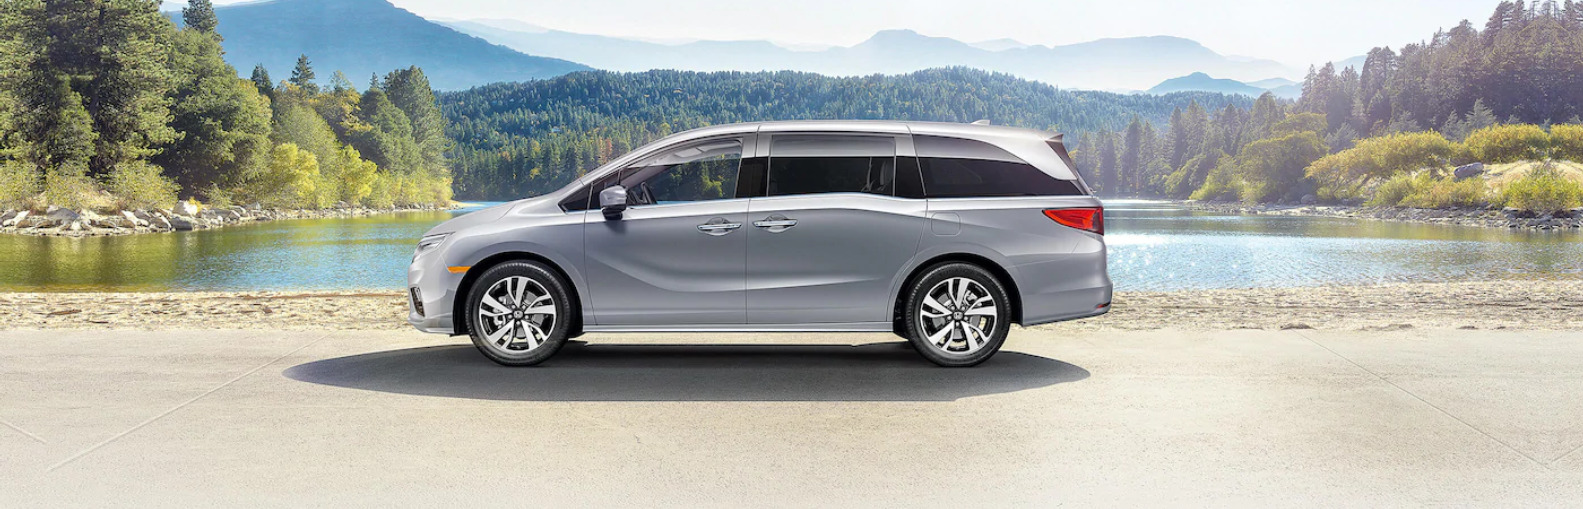 2020 Honda Odyssey Leasing near Manassas, VA